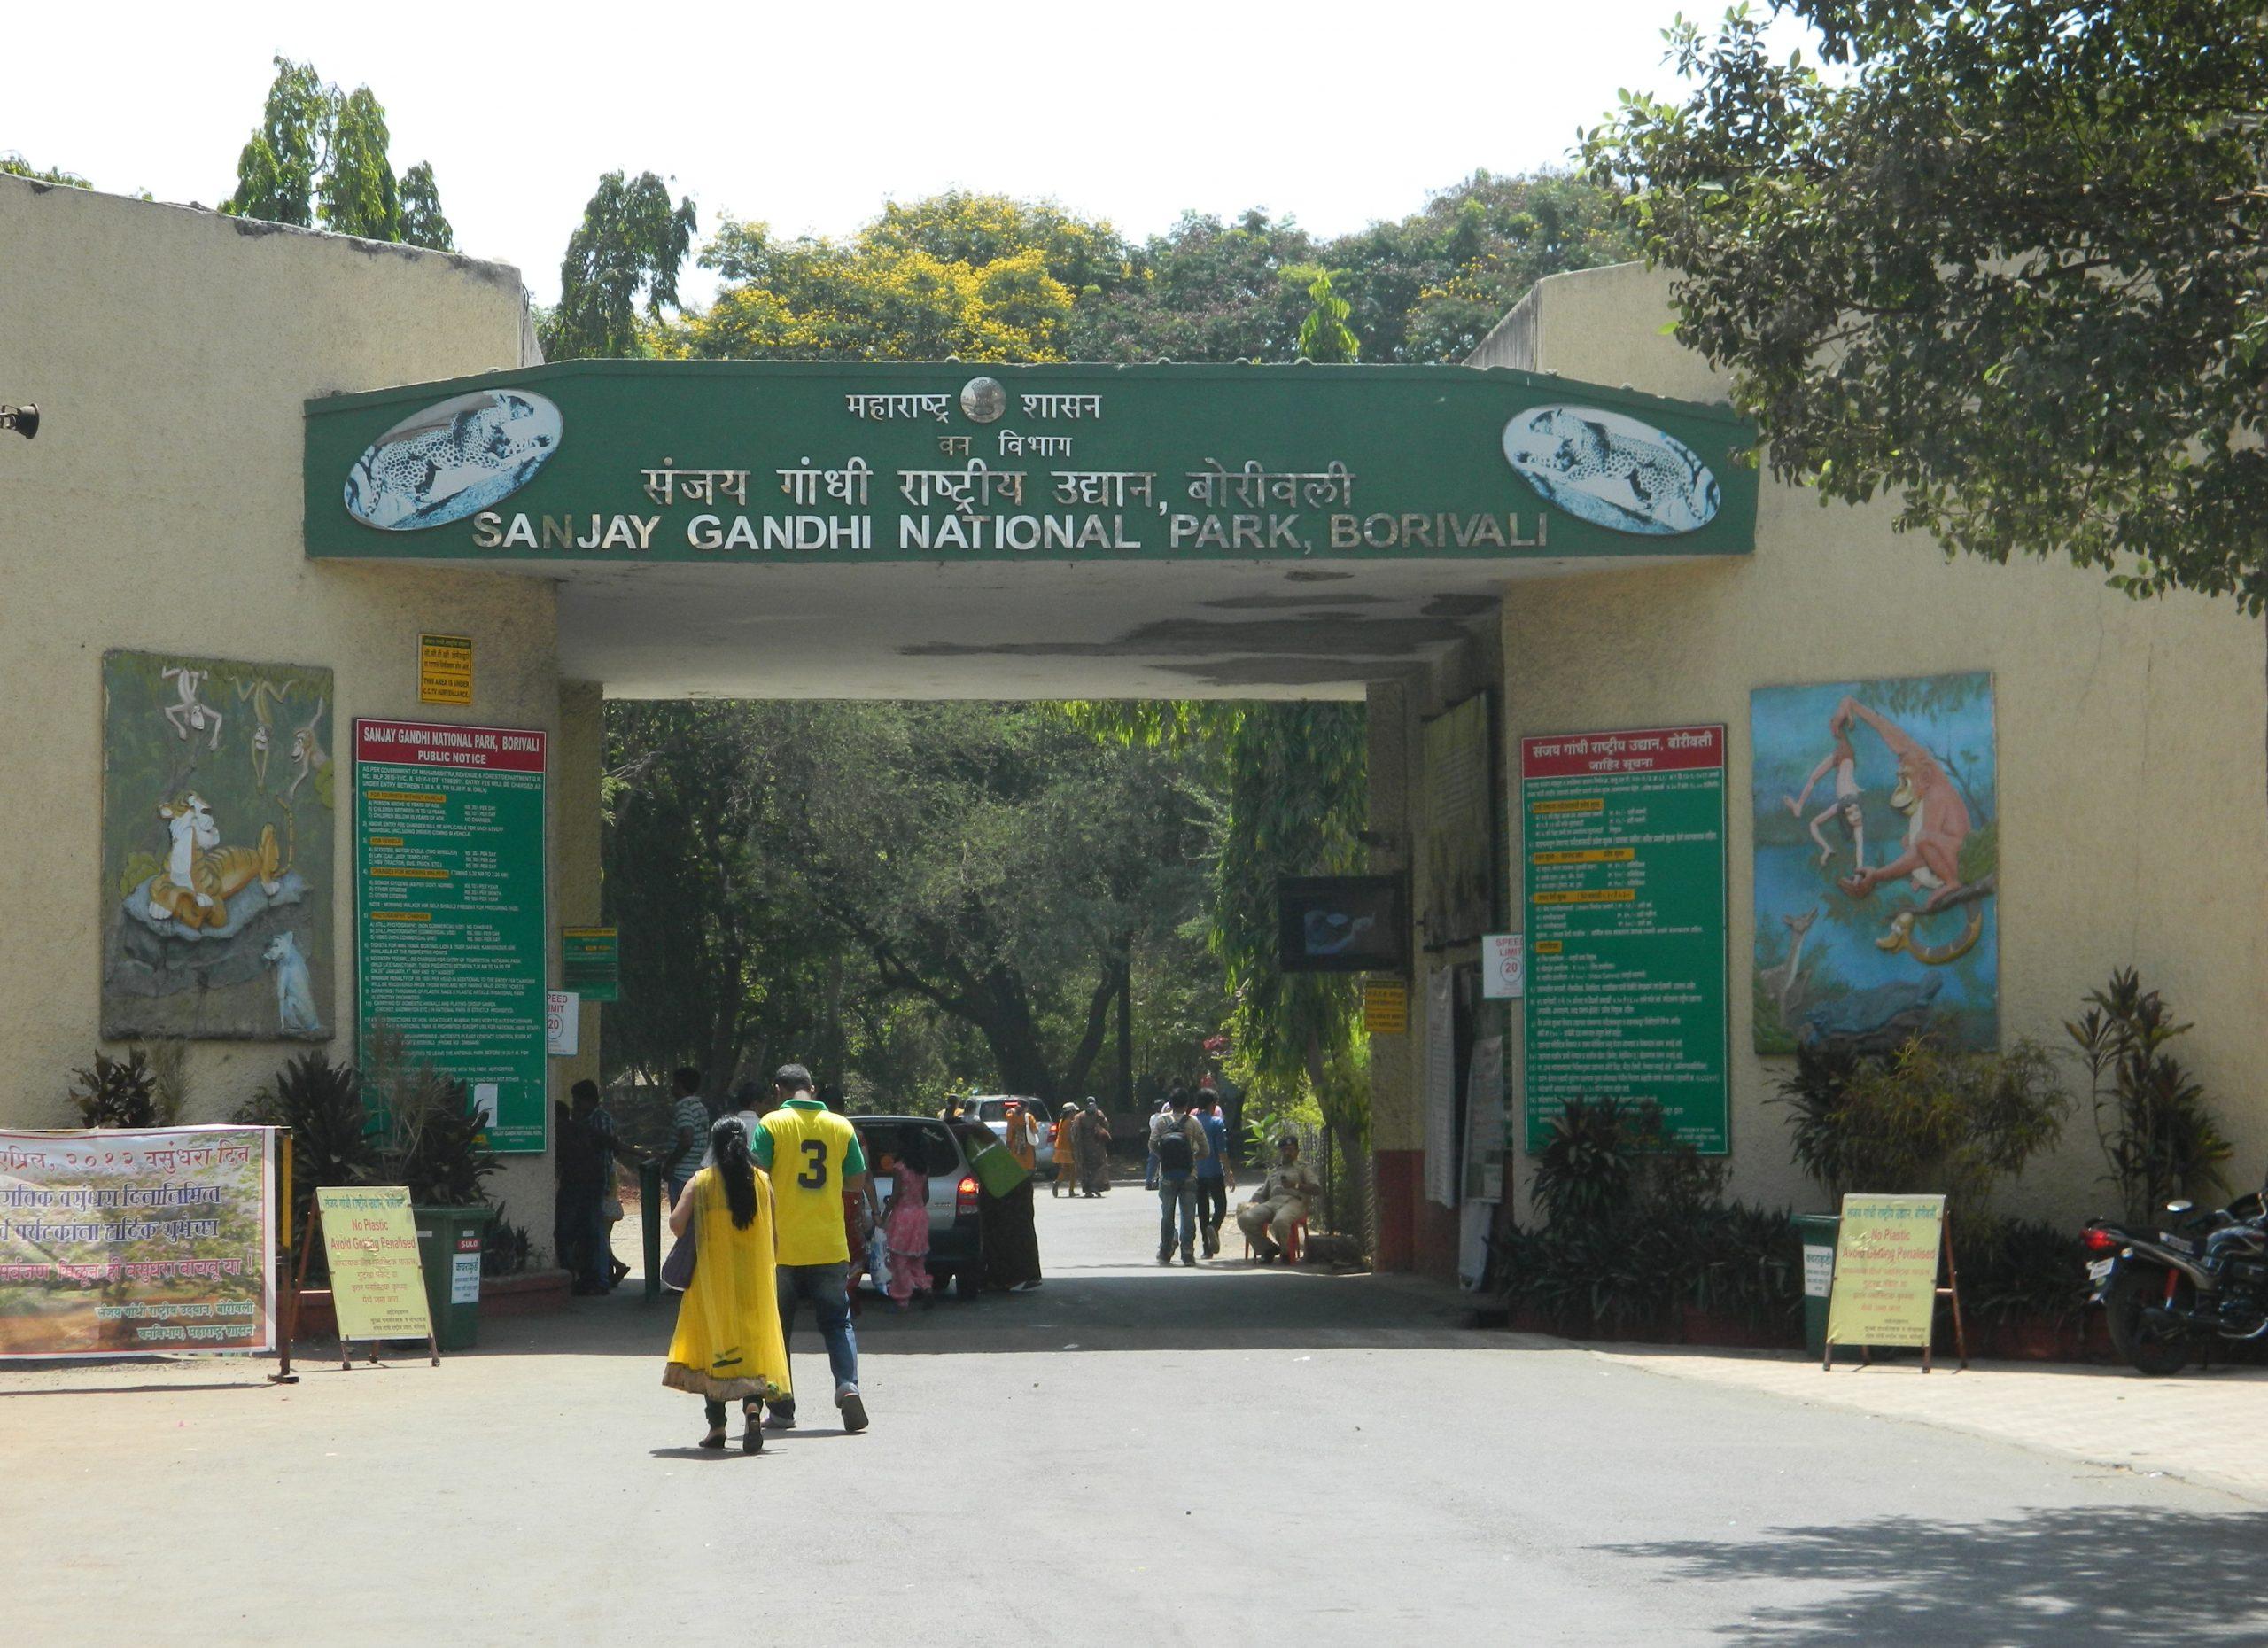 Beautiful Place to Visit Near By Veermata Jijabai Bhosale Udyan and Zoo - Borivali National Park